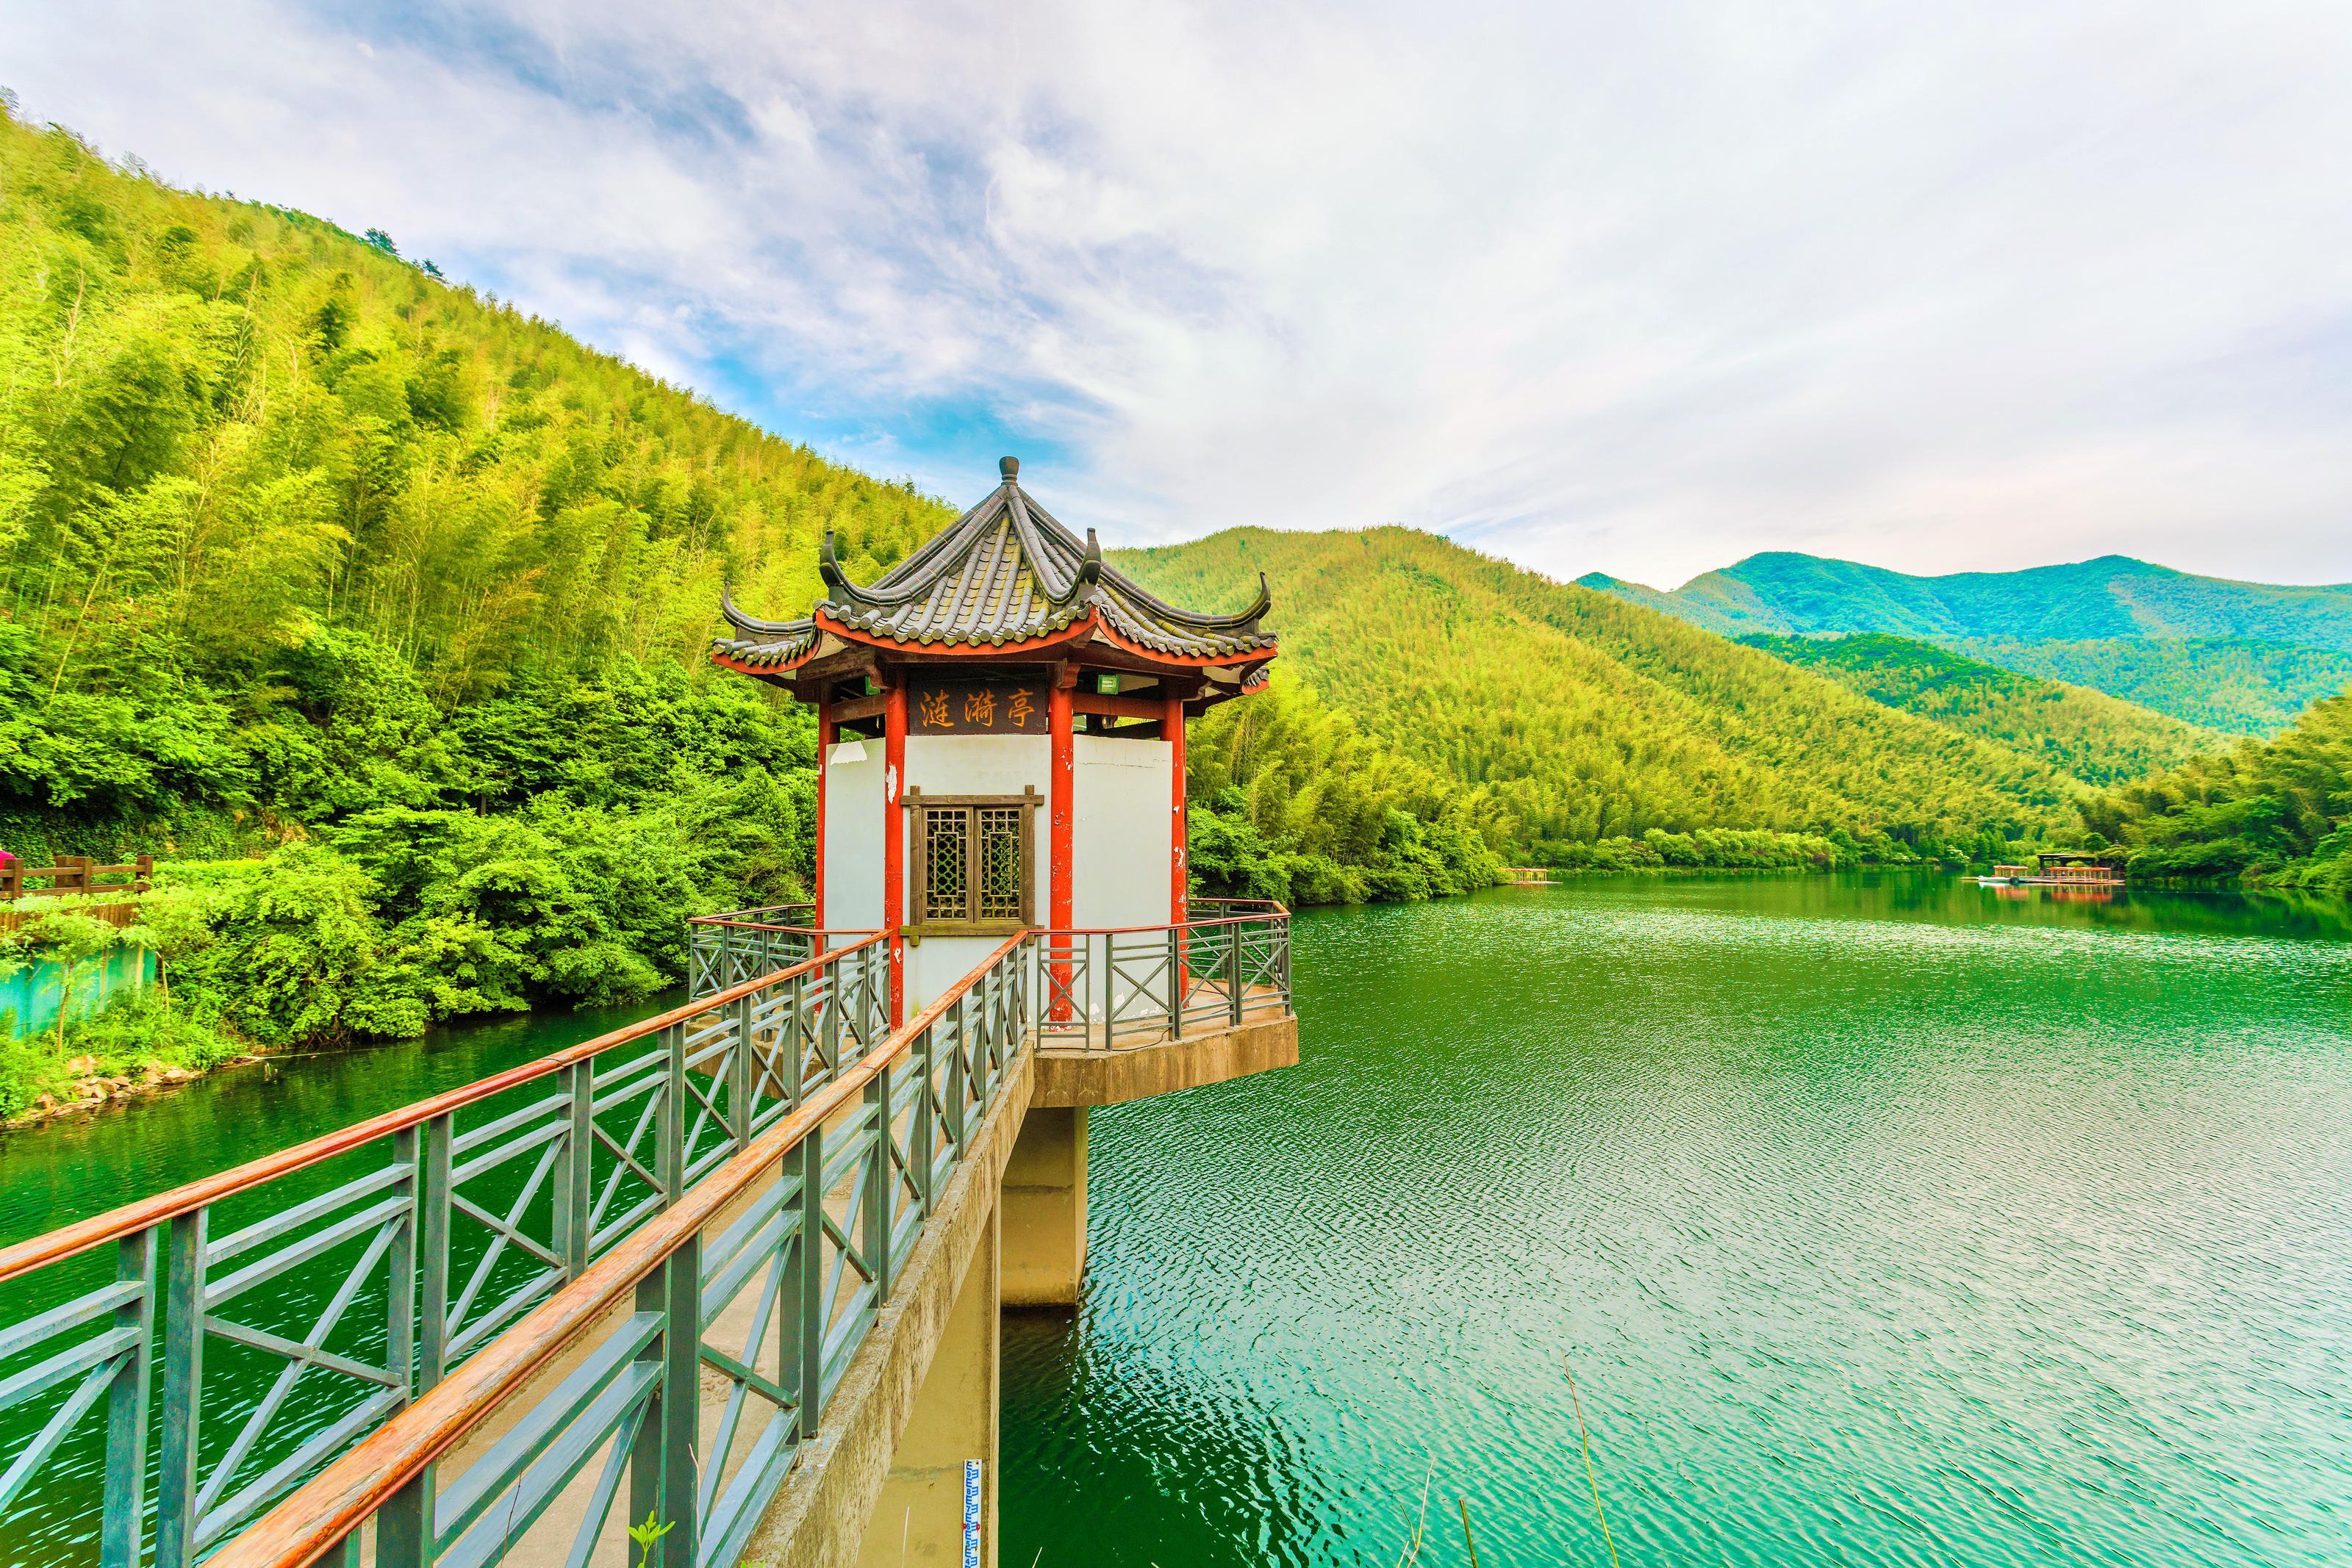 Jinghu Lake